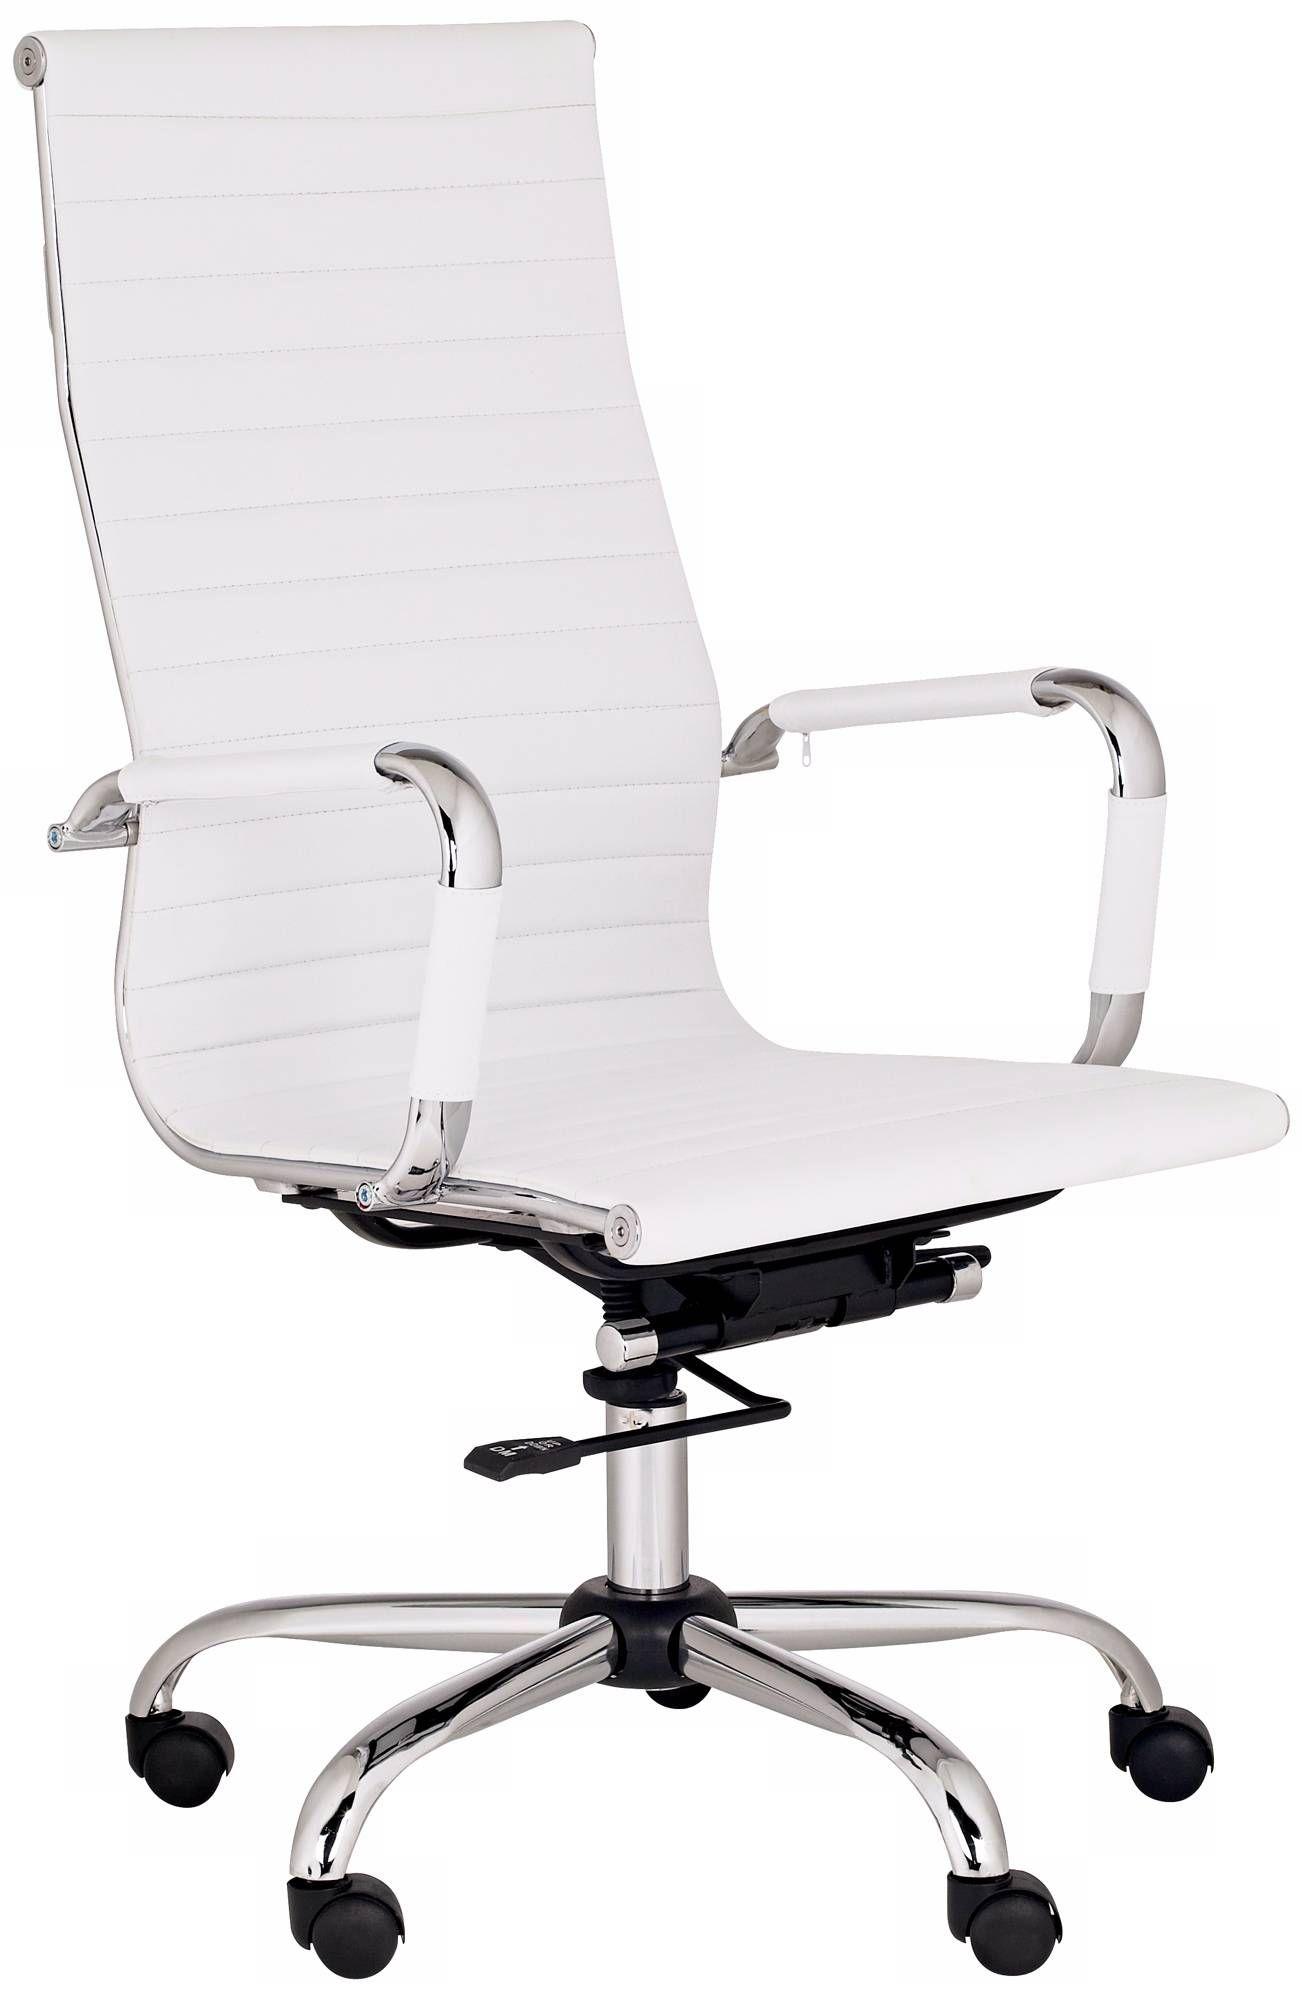 Serge White High Back Swivel Office Chair M5401 Lamps Plus Swivel Office Chair White Leather Office Chair High Back Office Chair